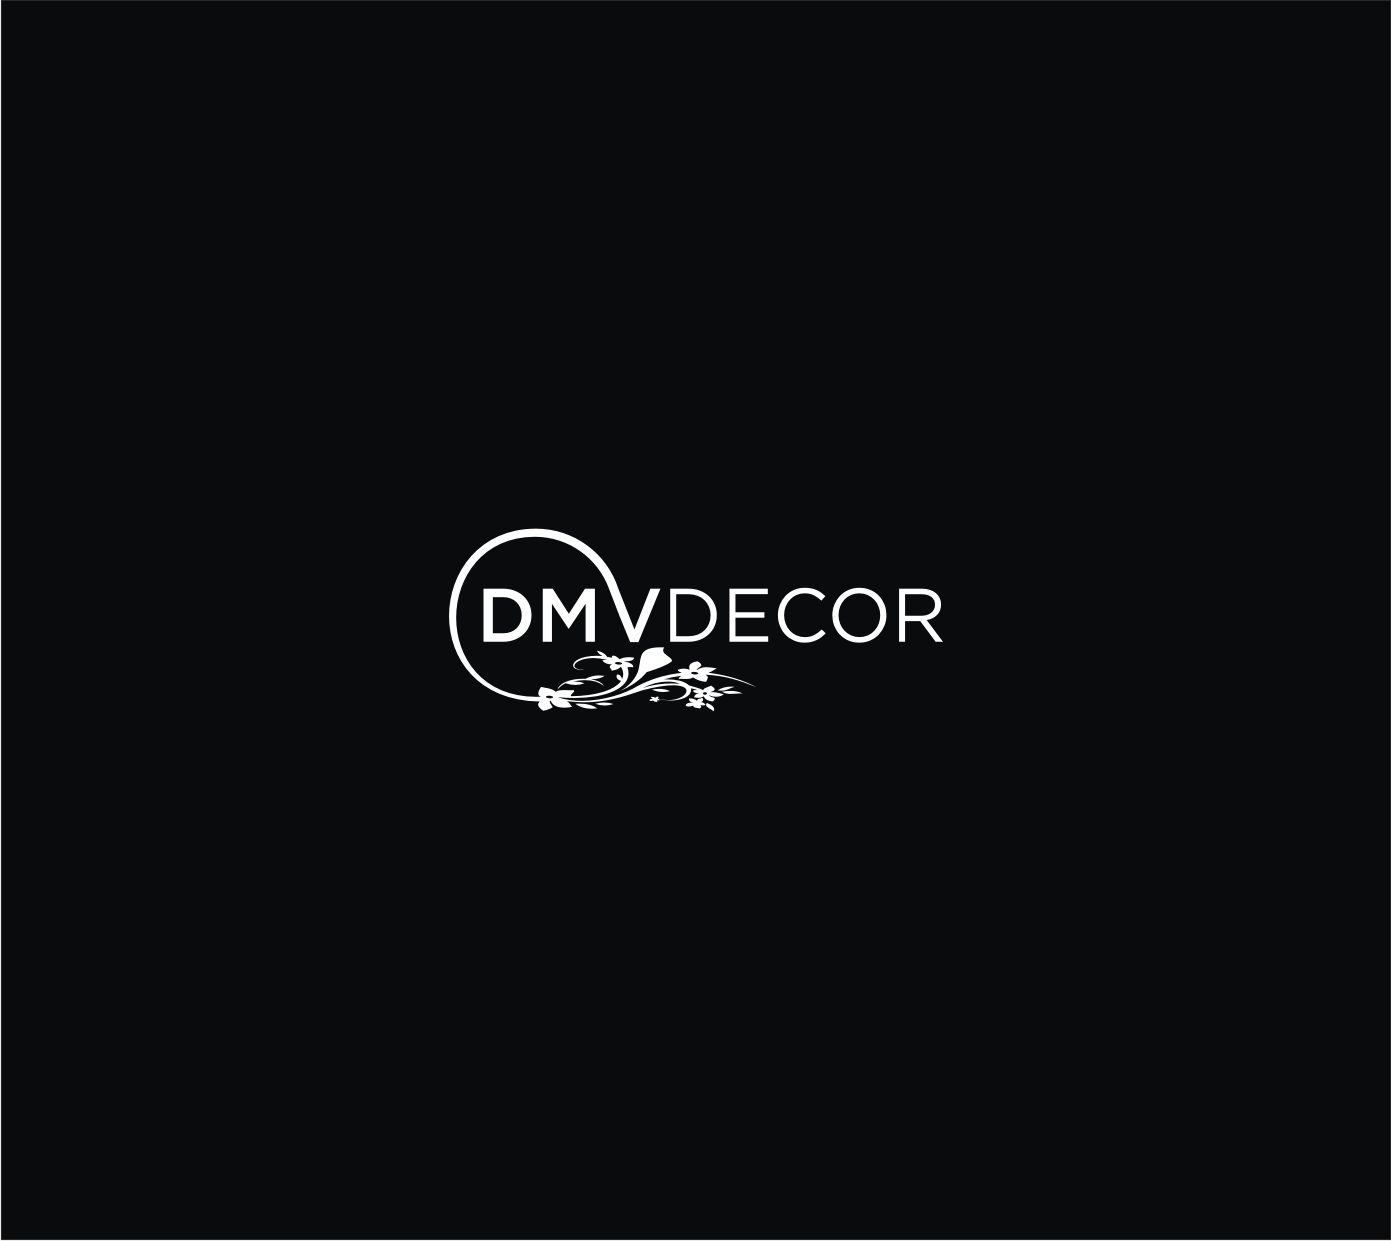 Logo Design by Sigitumarali Sigit - Entry No. 152 in the Logo Design Contest dmvdecor Logo Design.